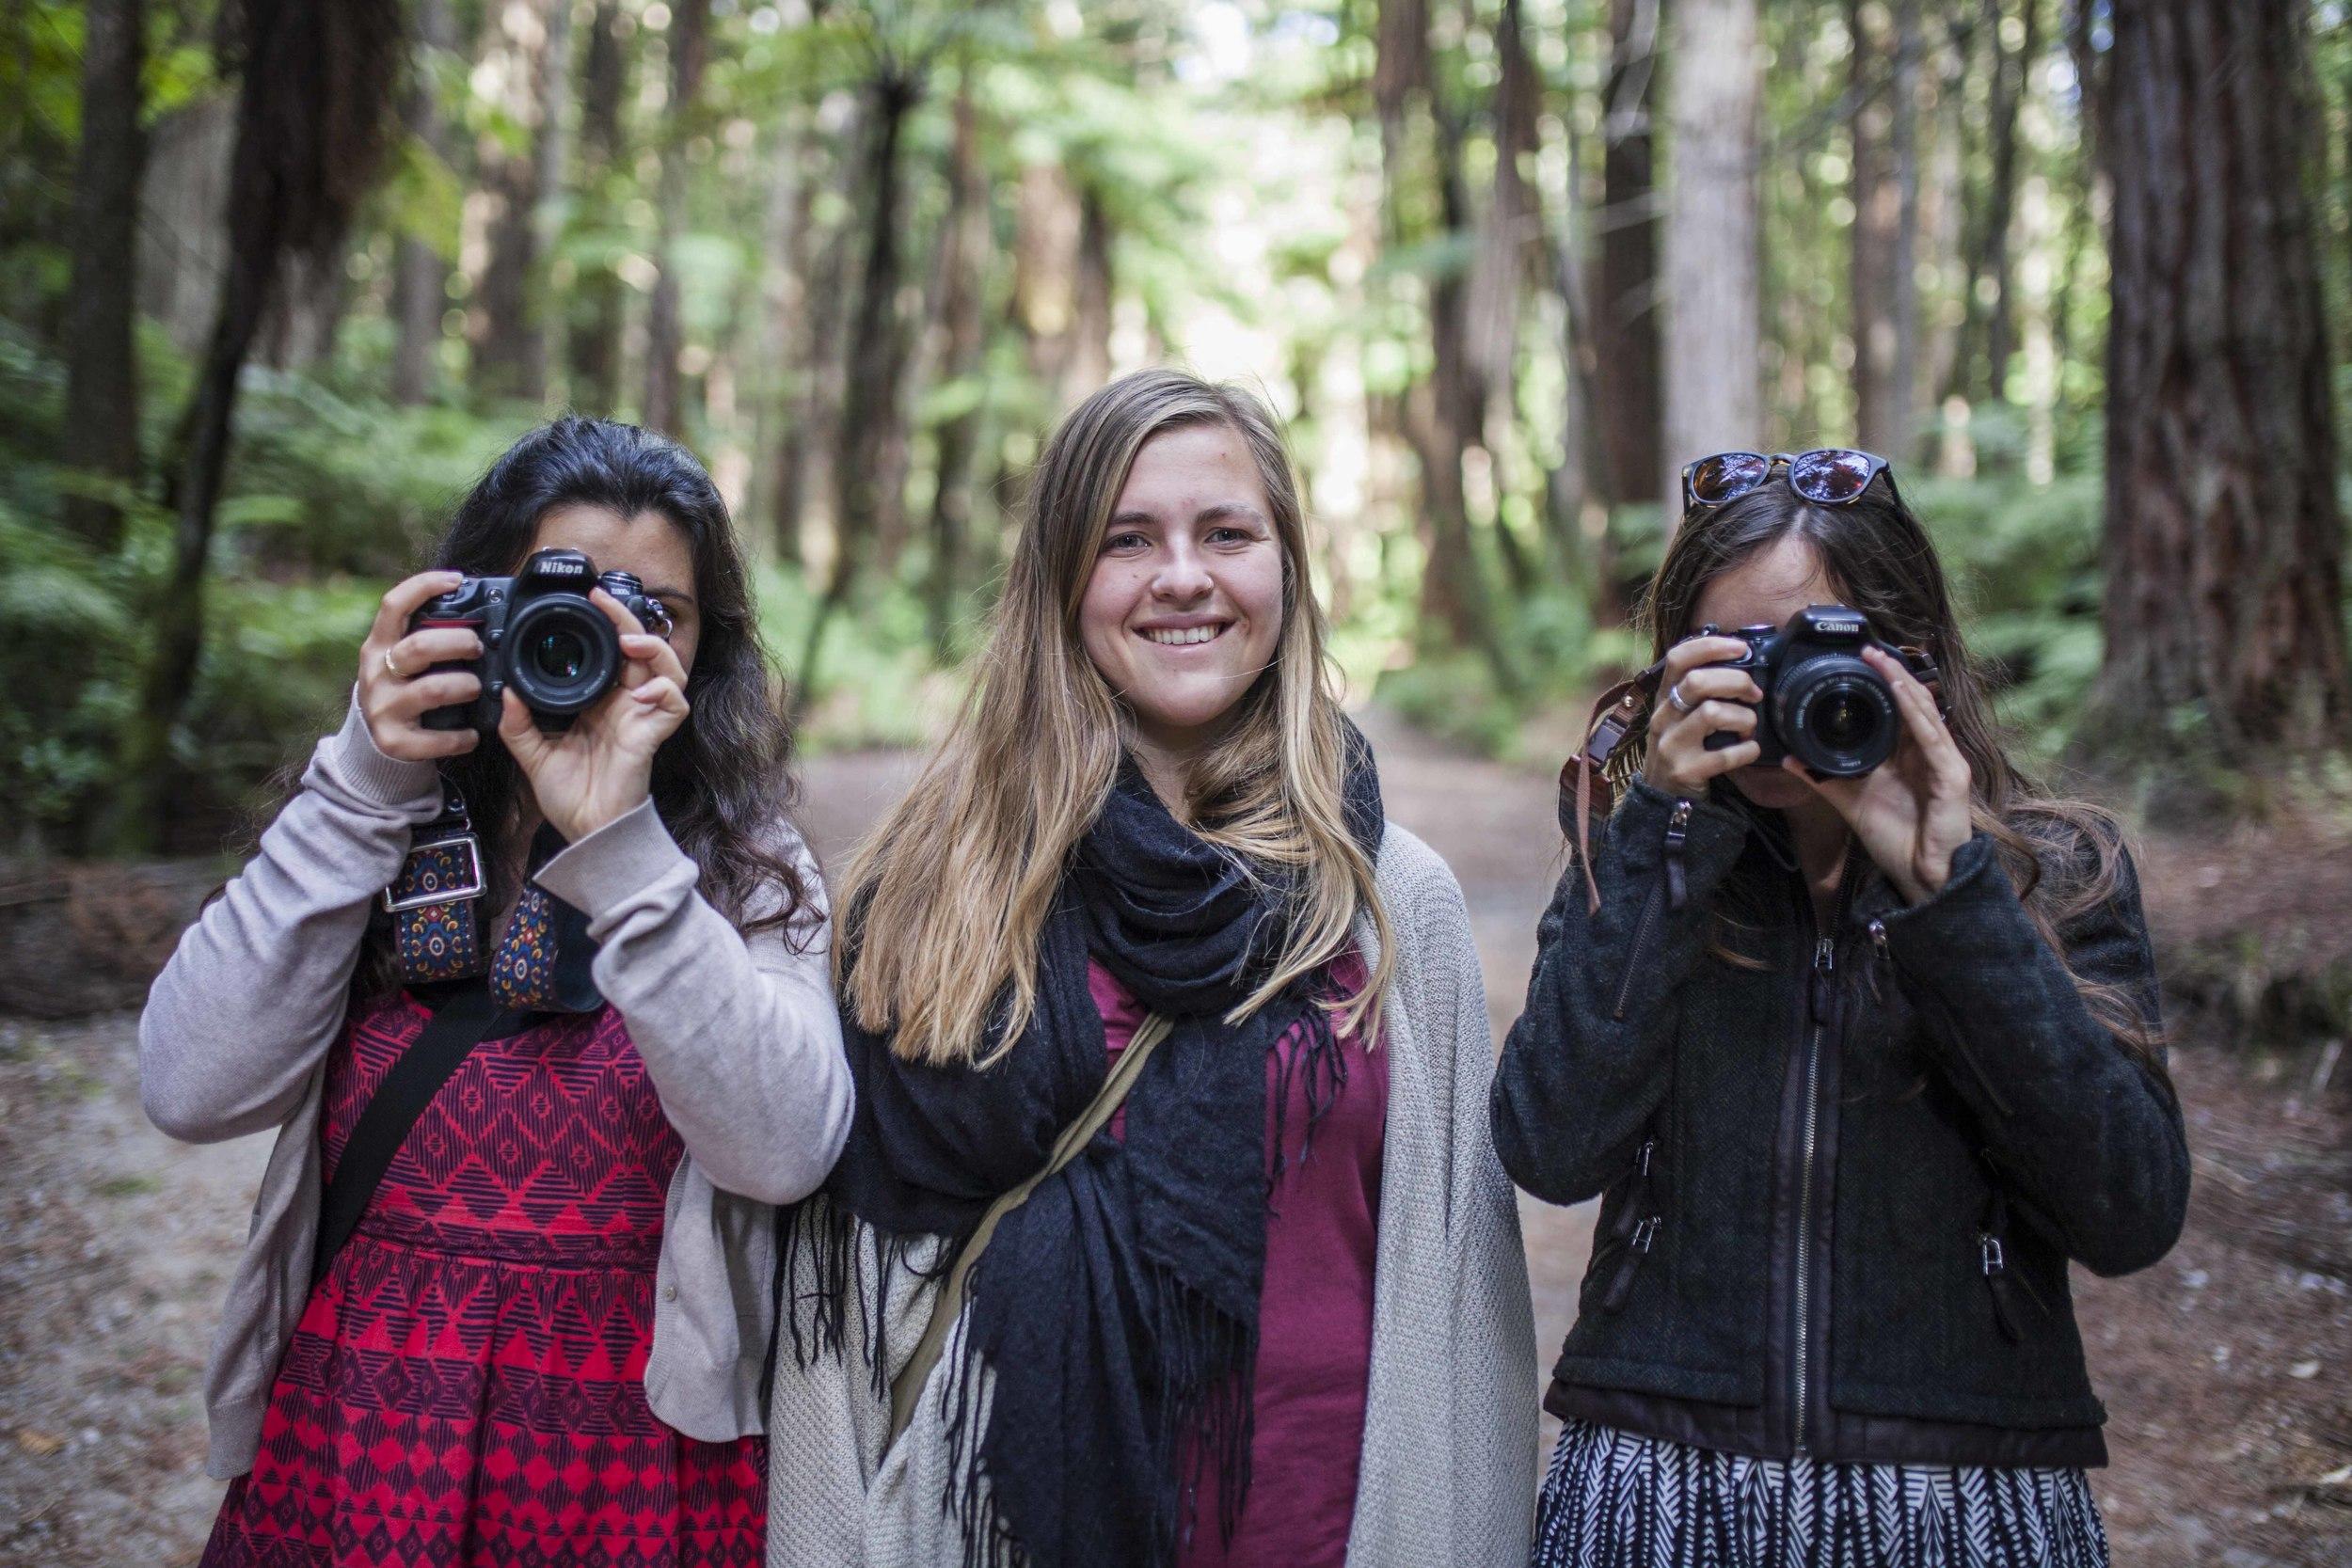 025Toronto Lifestyle Photographers - Jono & Laynie Co.jpg